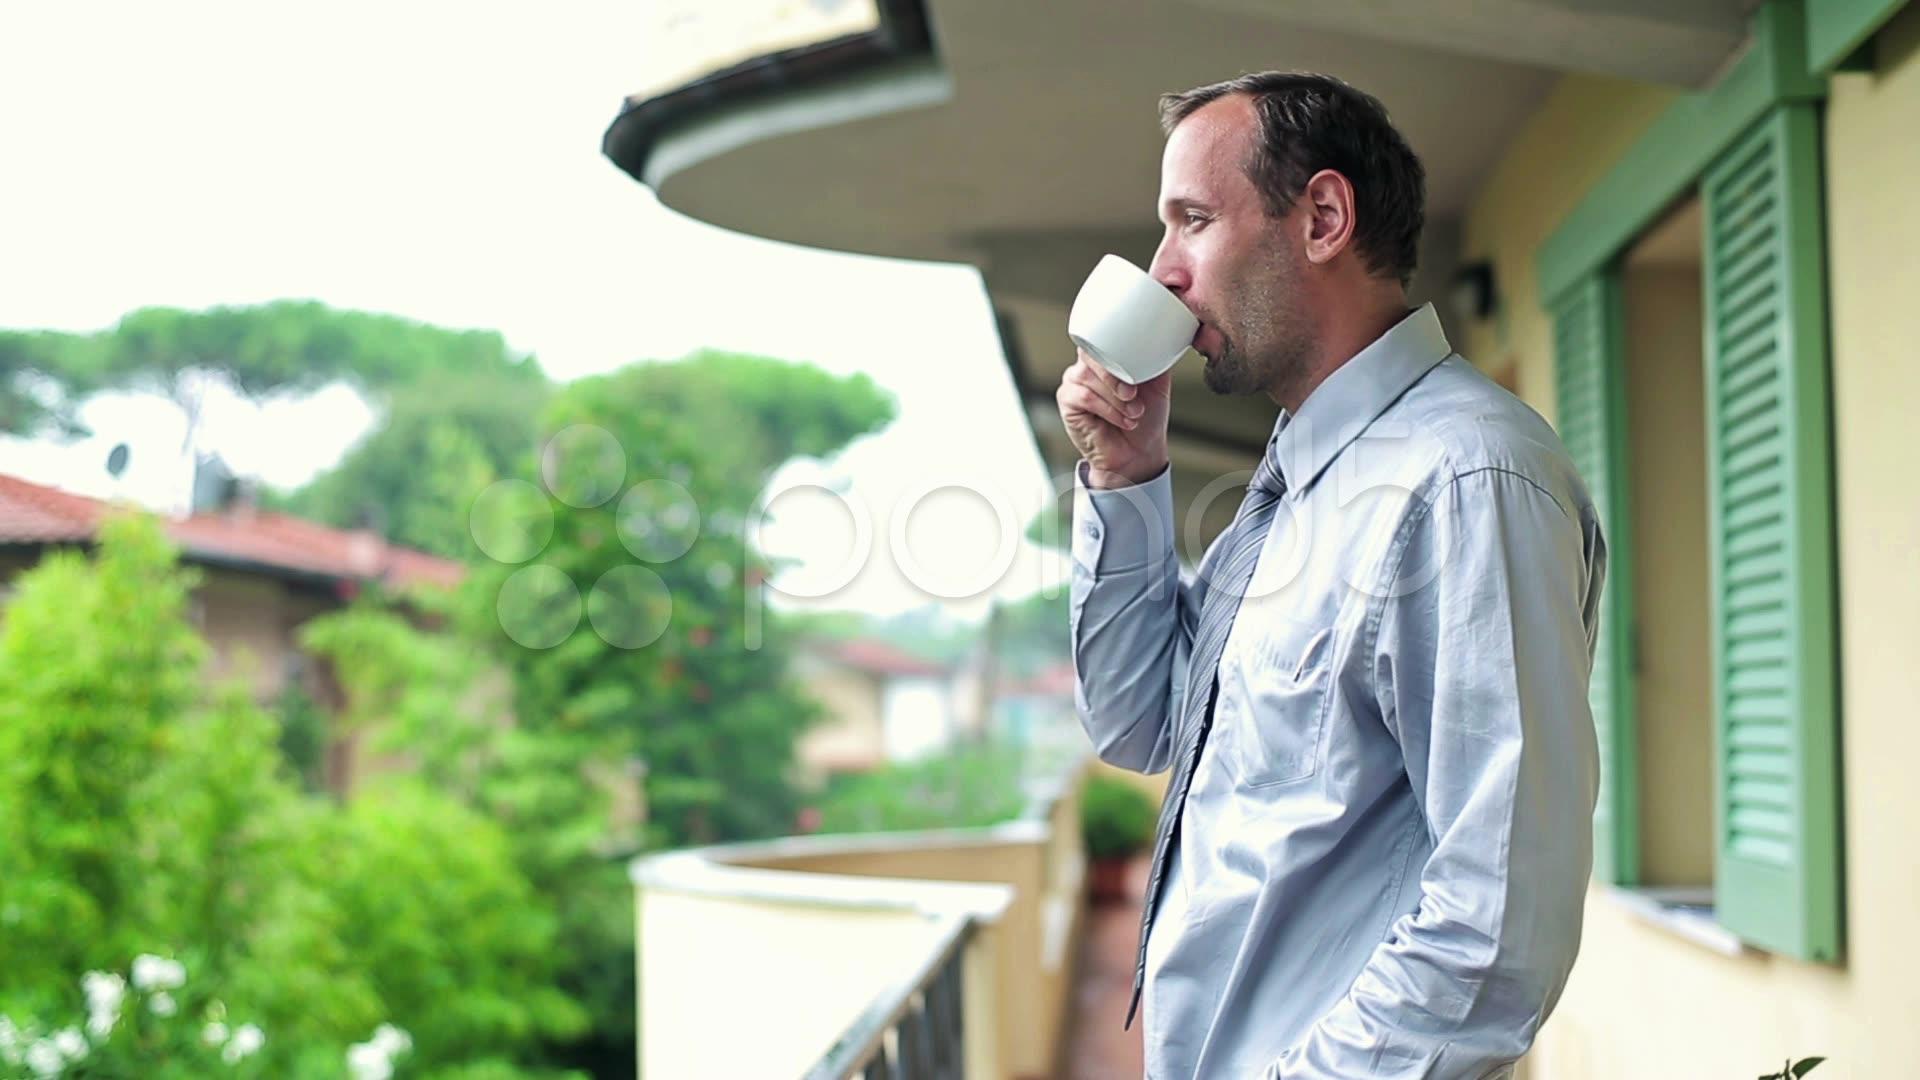 çay içen adam resmi